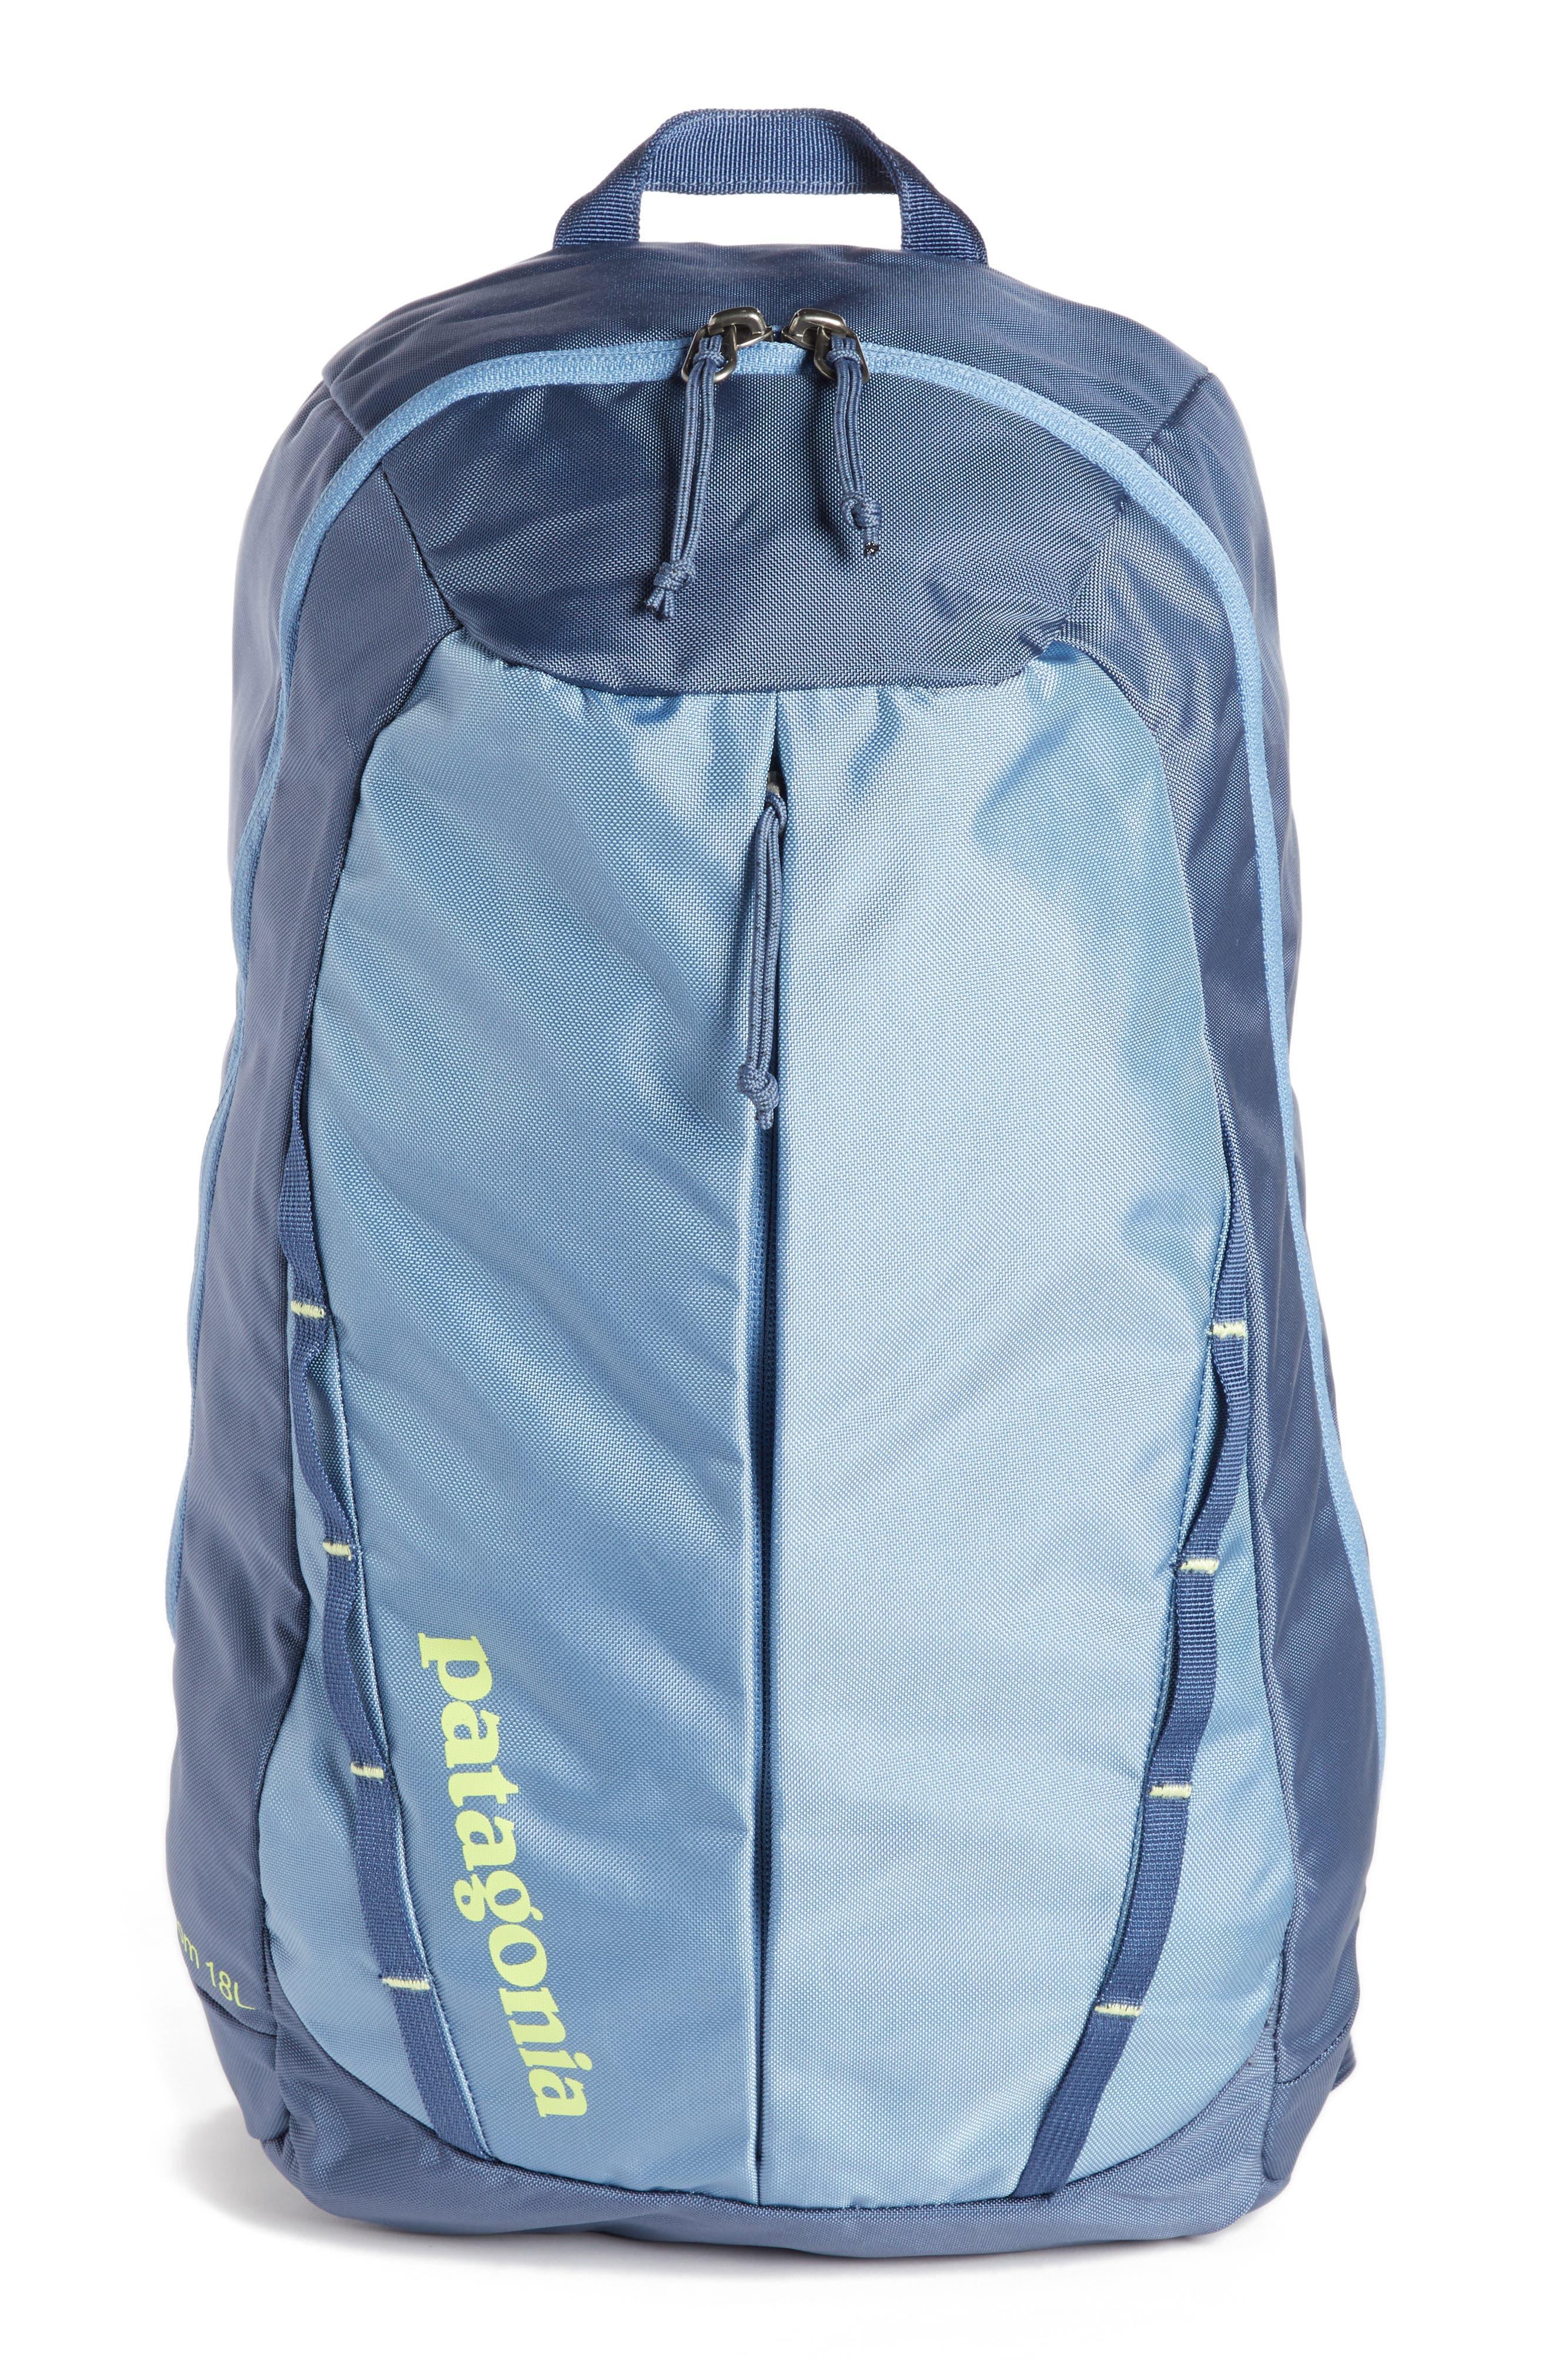 18L Atom Backpack,                             Main thumbnail 1, color,                             Dolomite Blue